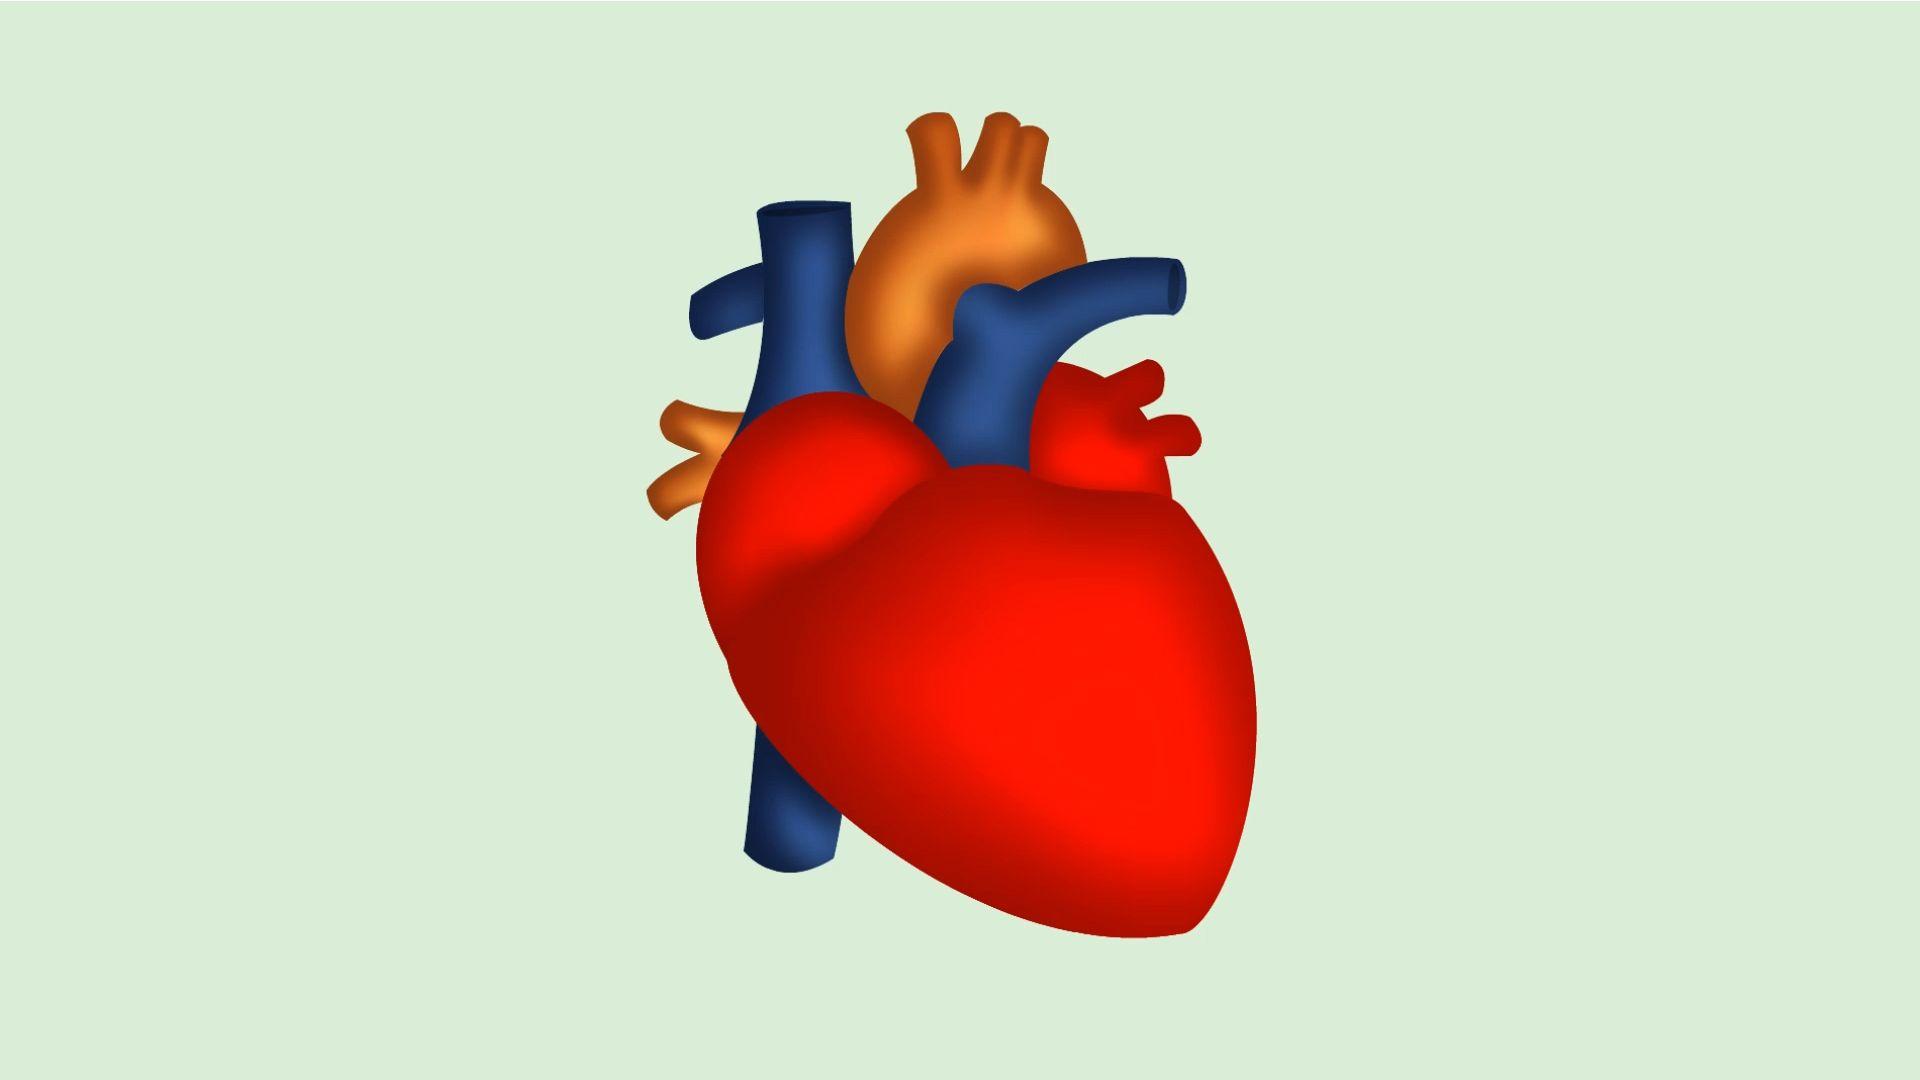 How to Draw a Human Heart | Human heart, Human heart ...